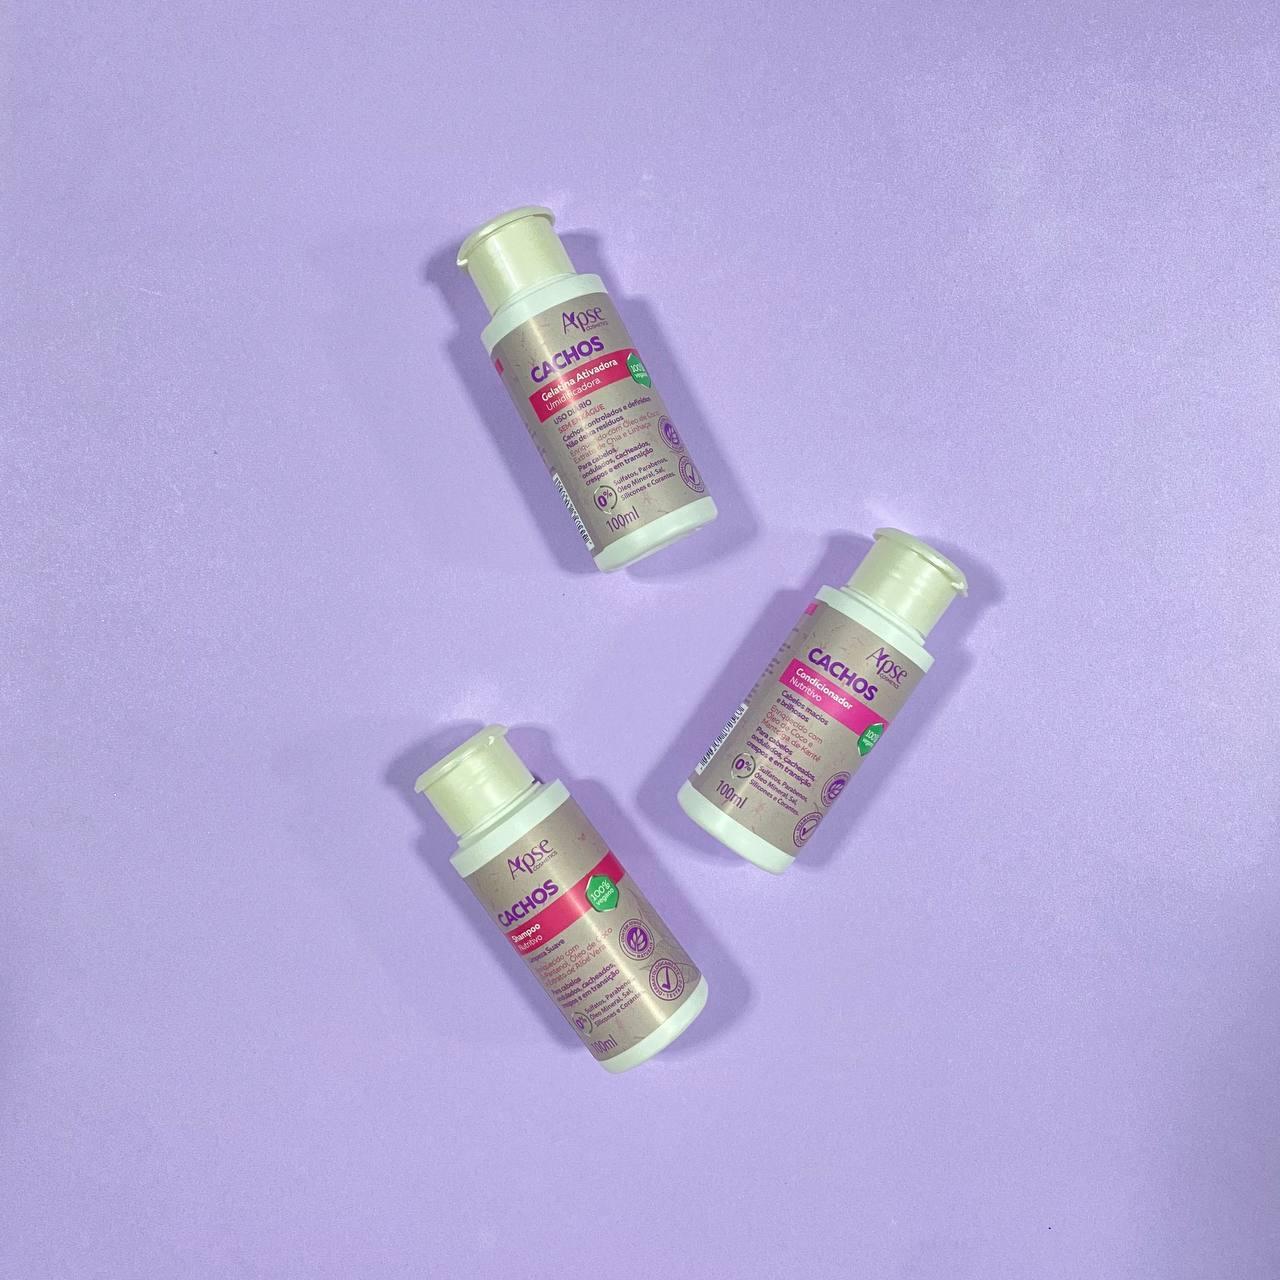 Kit Cachos Viagem - Apse Cosmetics